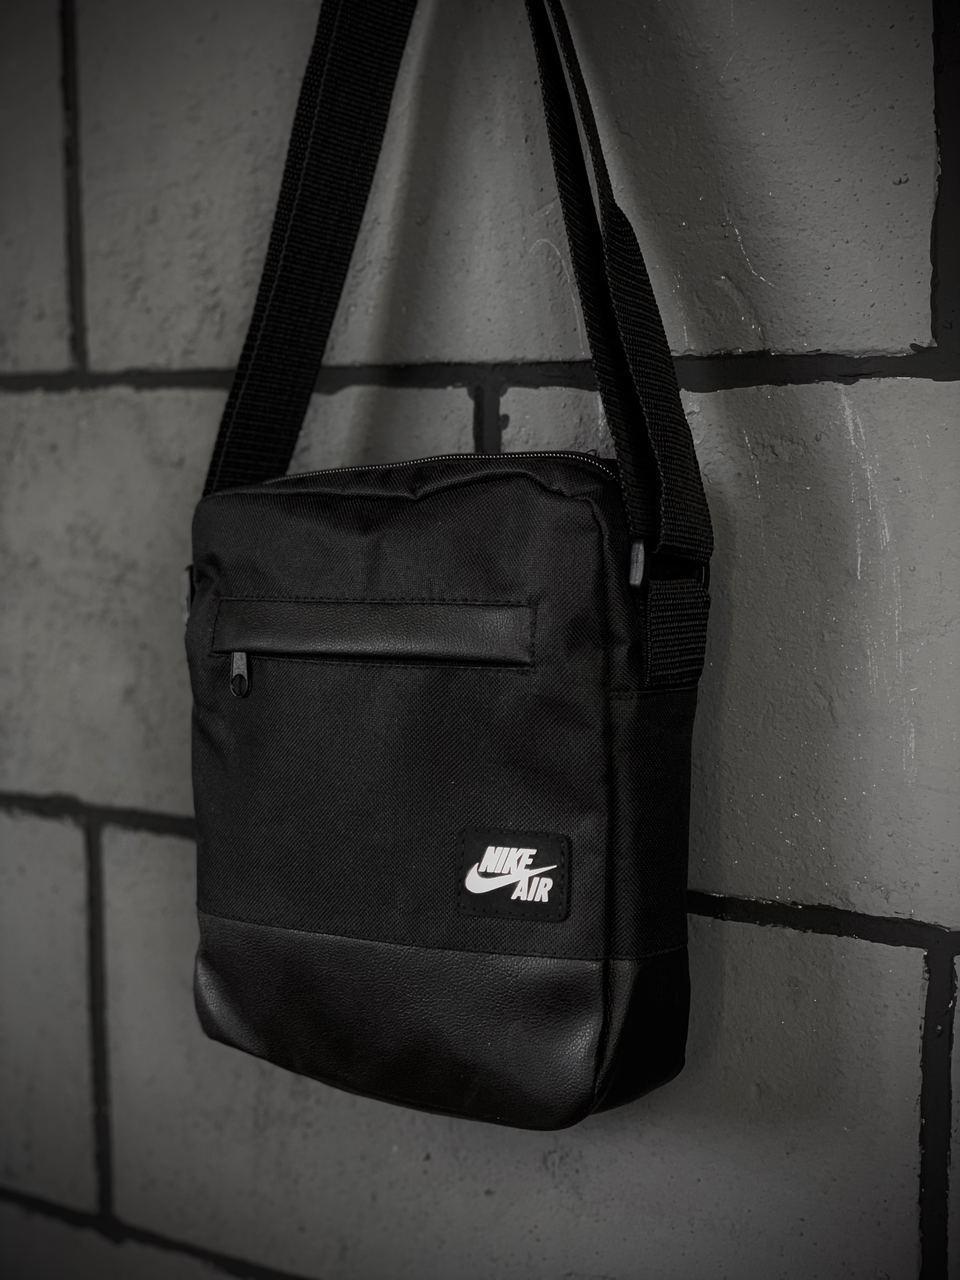 Барсетка Nike Unique черная Мужская найк сумка через плечо